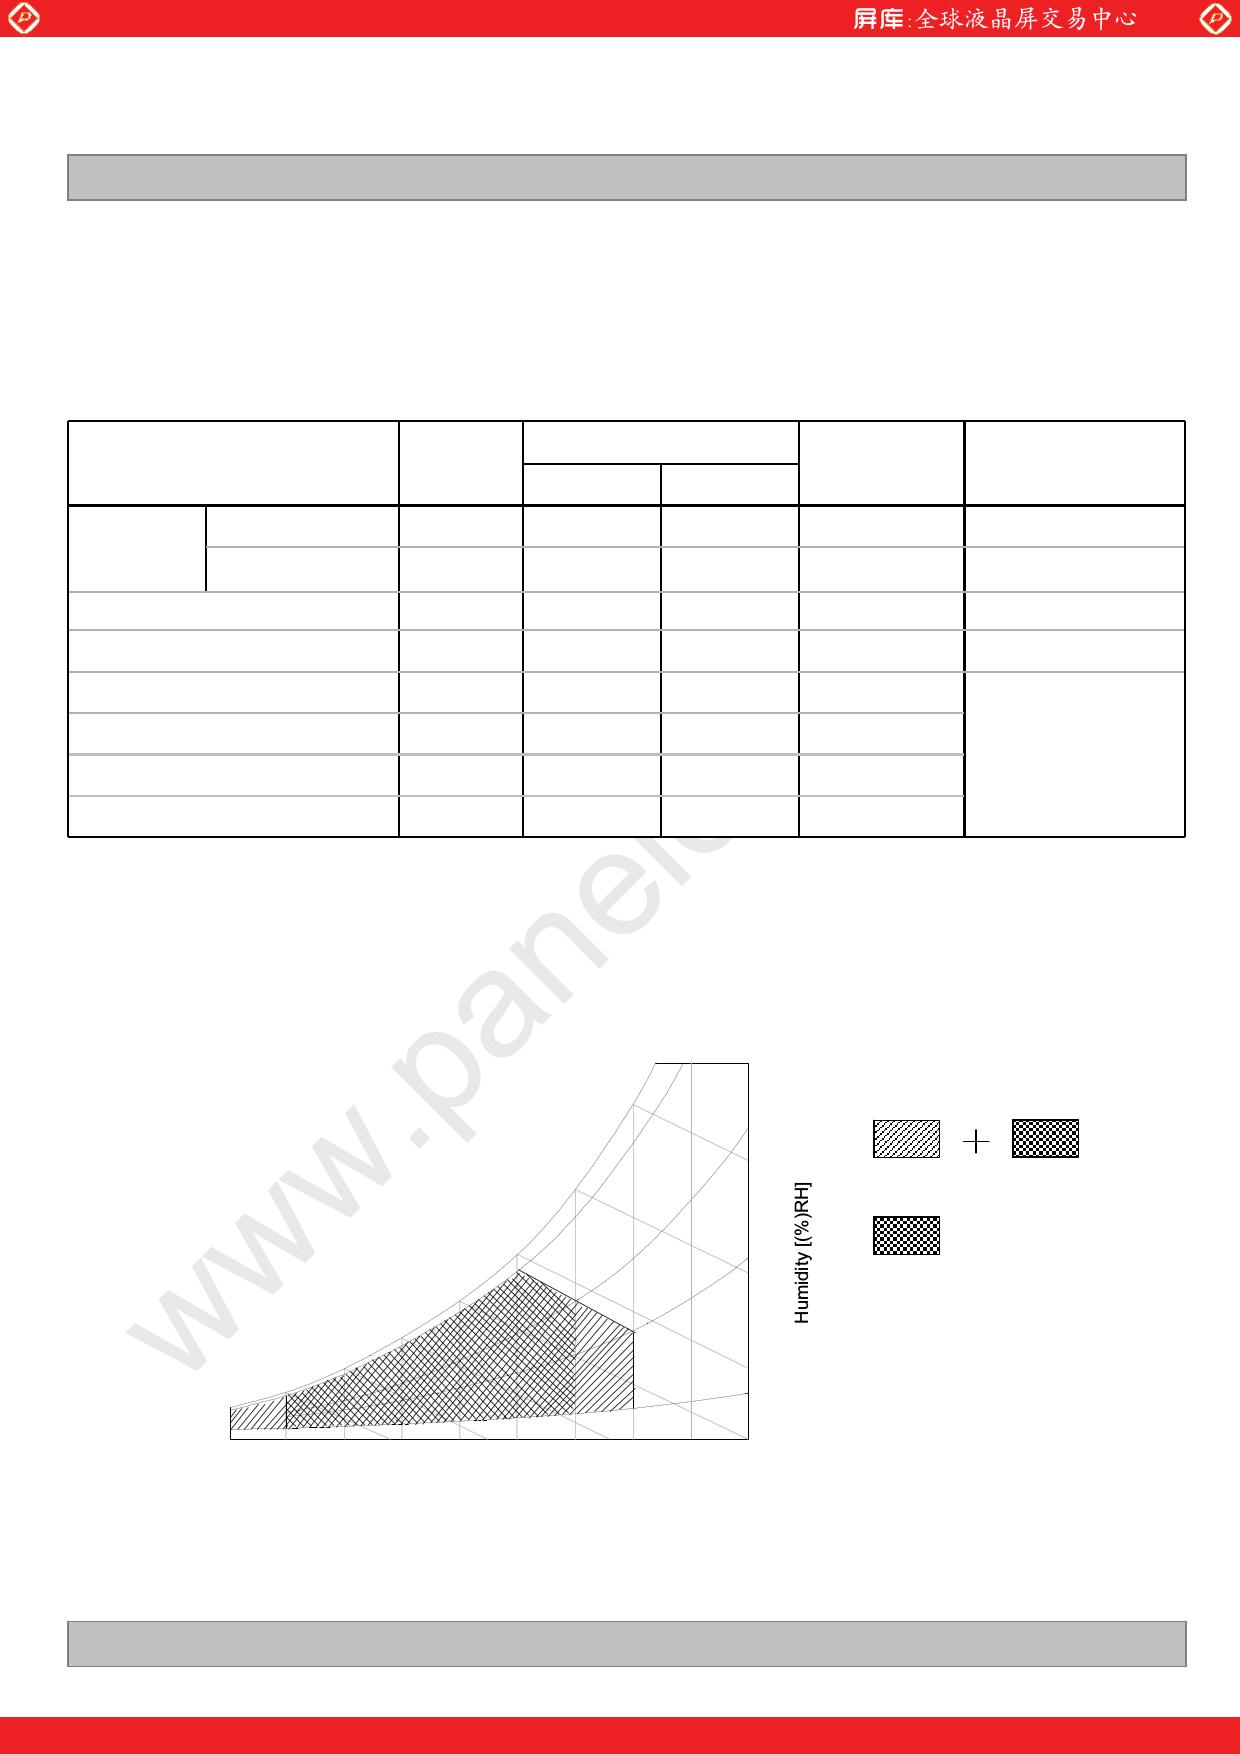 LC320WXN-SBD1 pdf